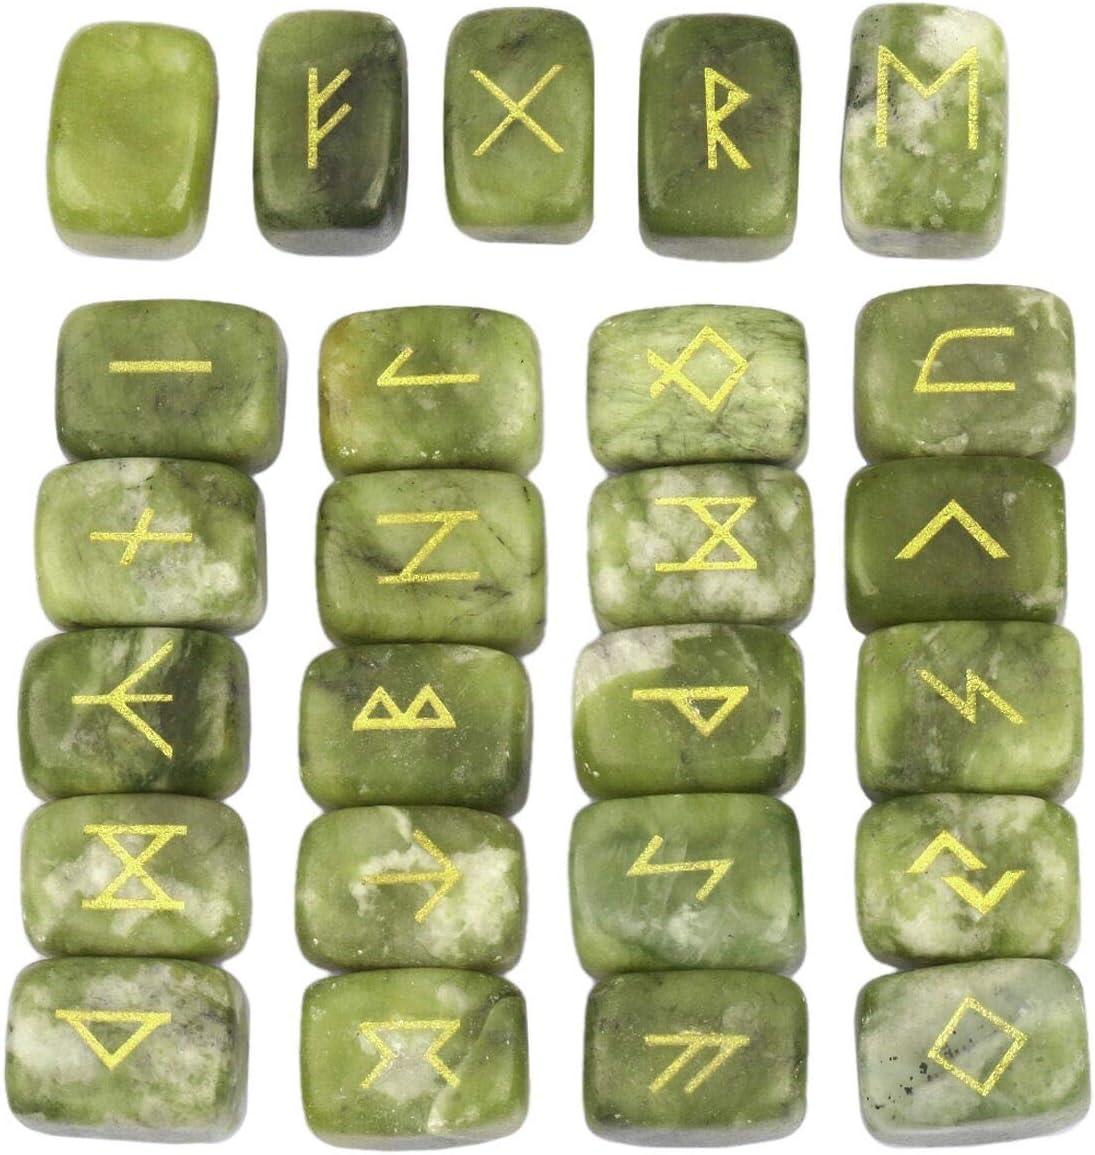 mookaitedecor Rune Stones Set with Engraved Elder Futhark Alphabet Crystal Meditation Divination,Green Jade